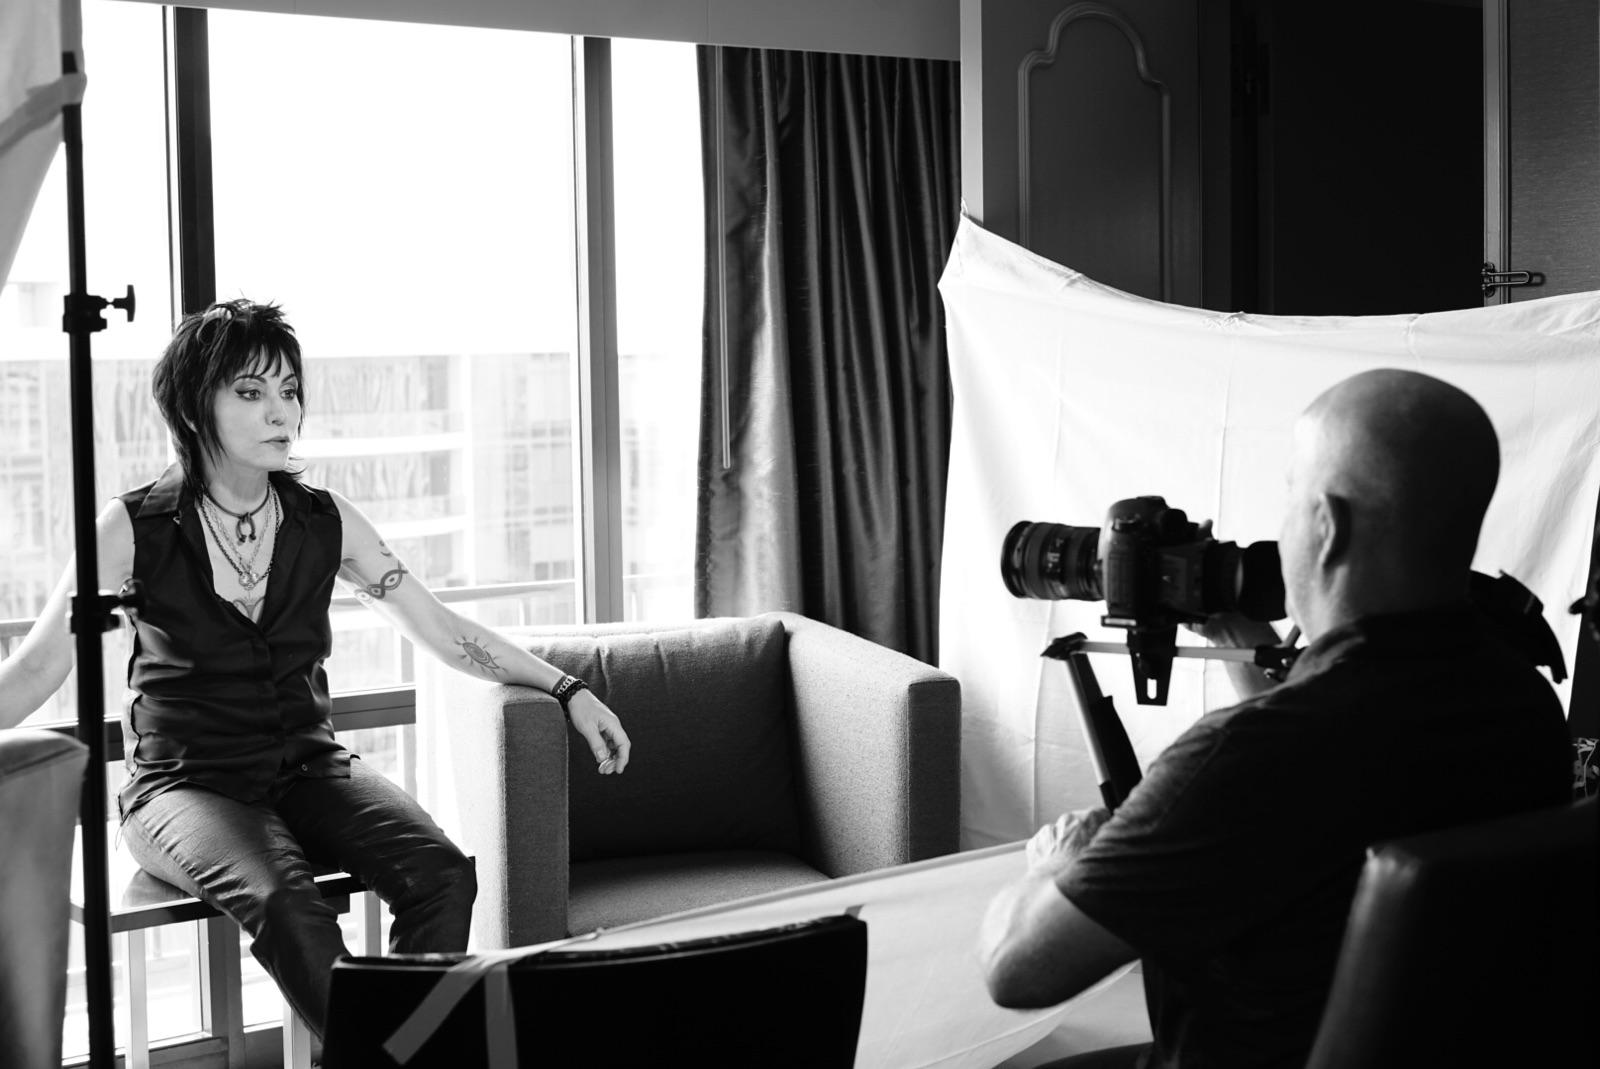 Sundance Documentary Cameras: Equipment Used For Non-Fiction